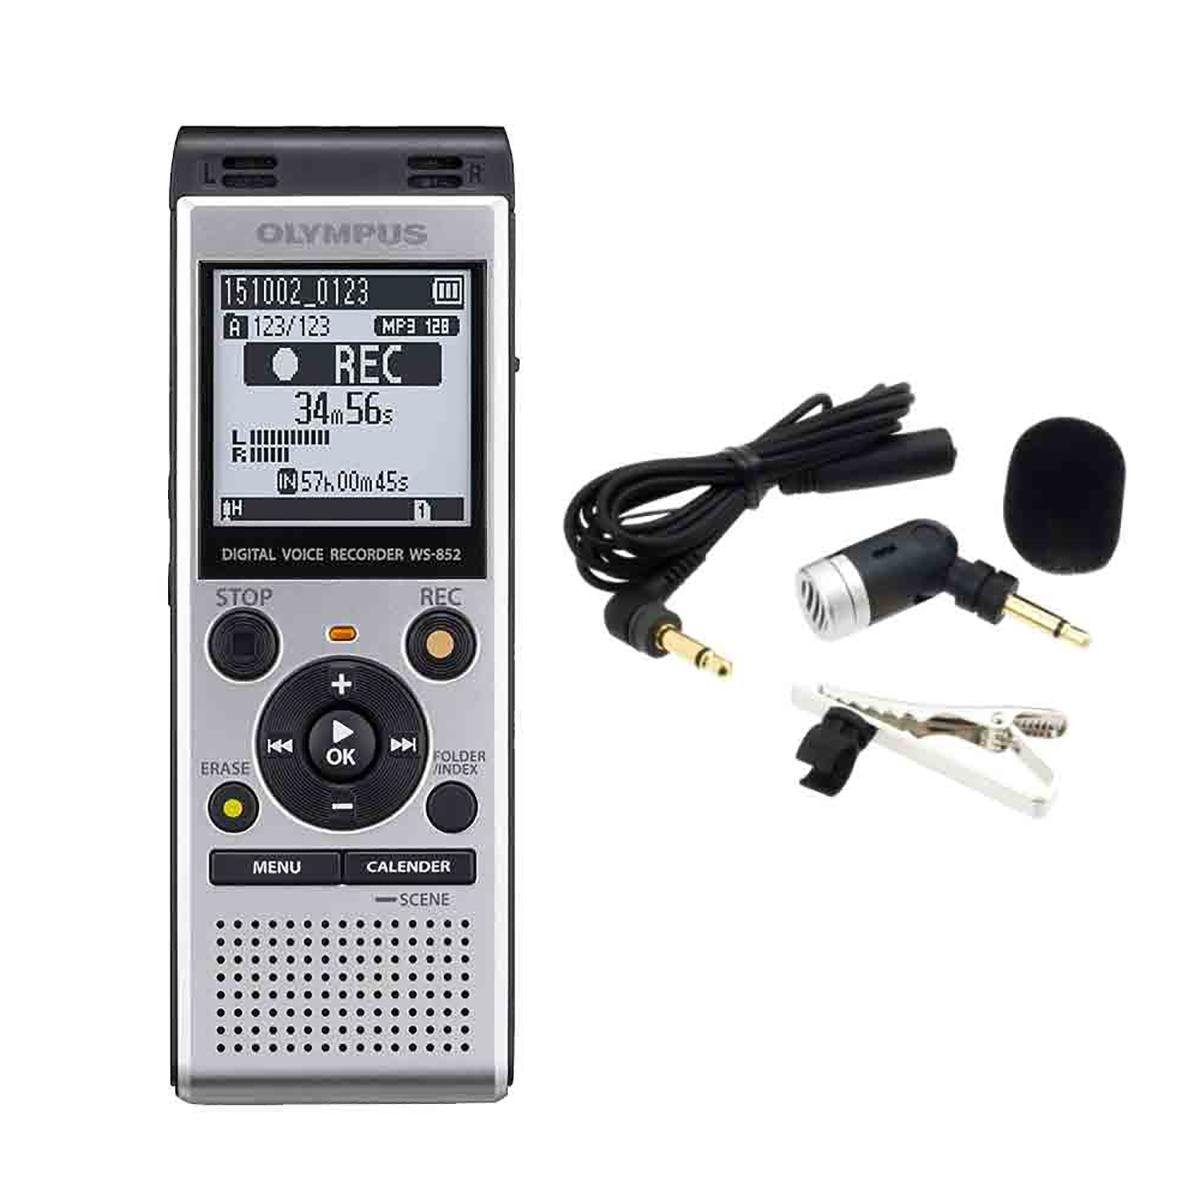 Olympus WS-852 4GB Digital Notetaker with ME52 Microphone